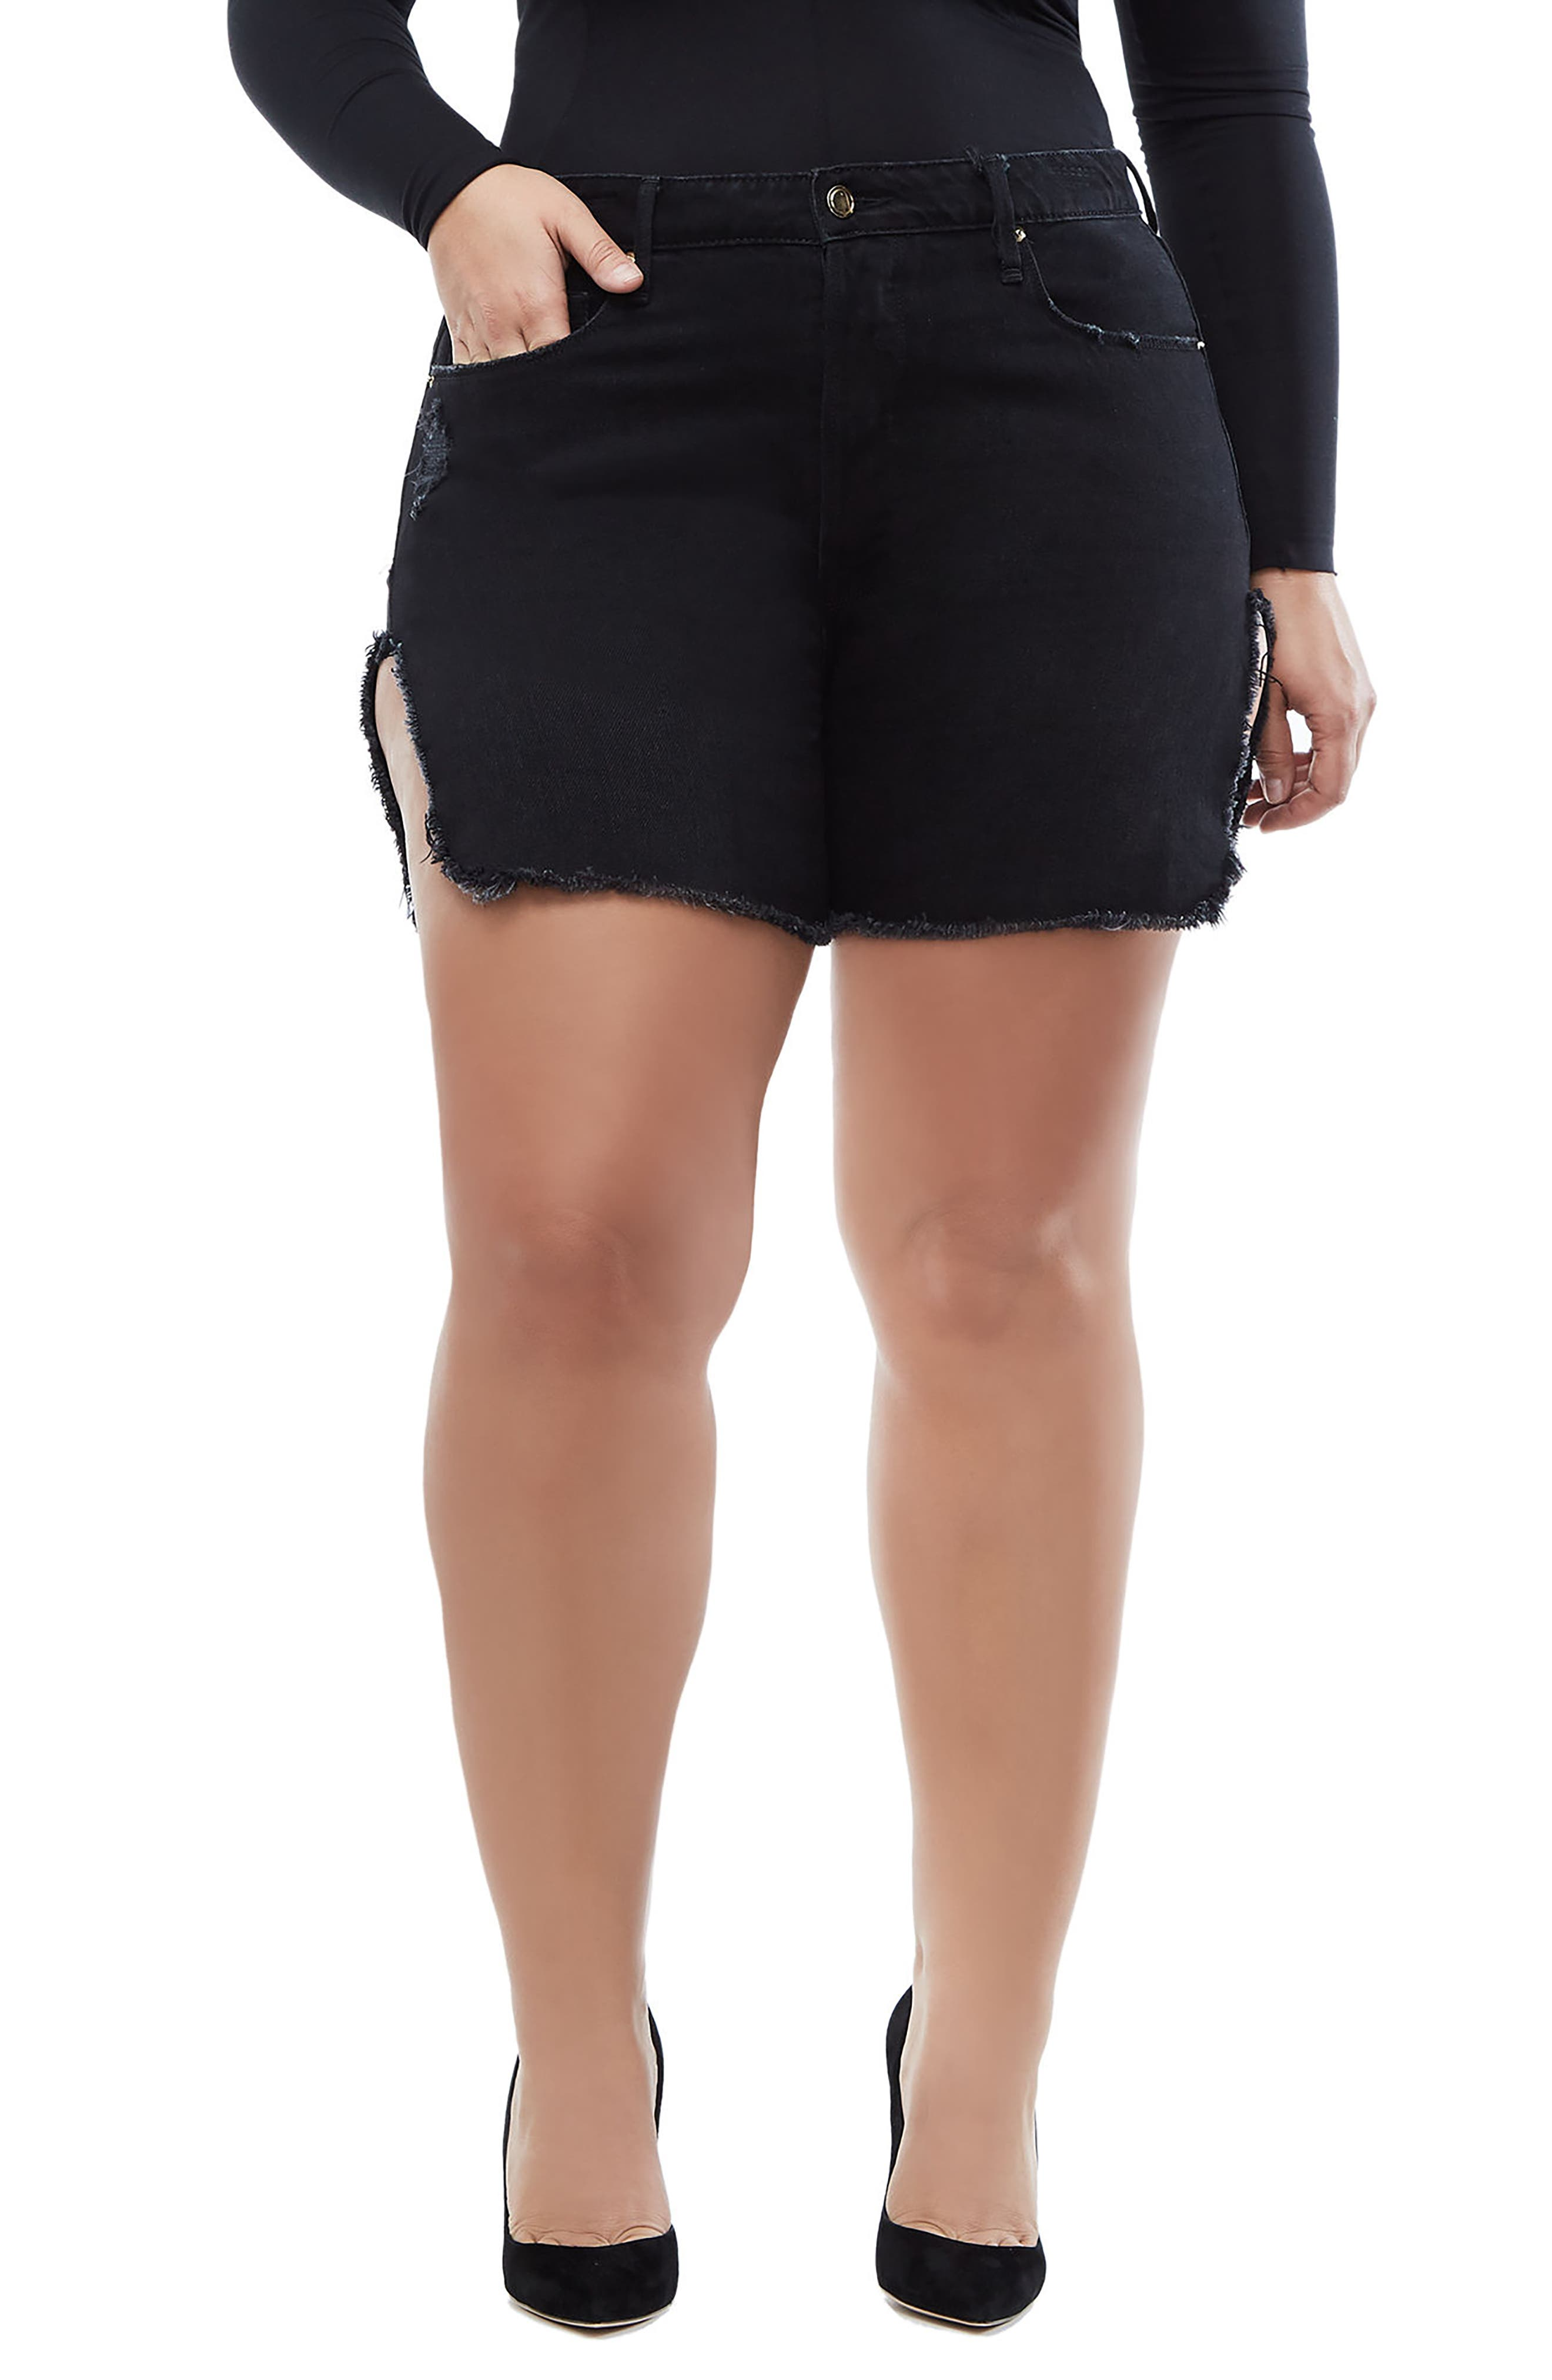 Bombshell High Waist Cutoff Denim Shorts,                             Alternate thumbnail 4, color,                             Black 019